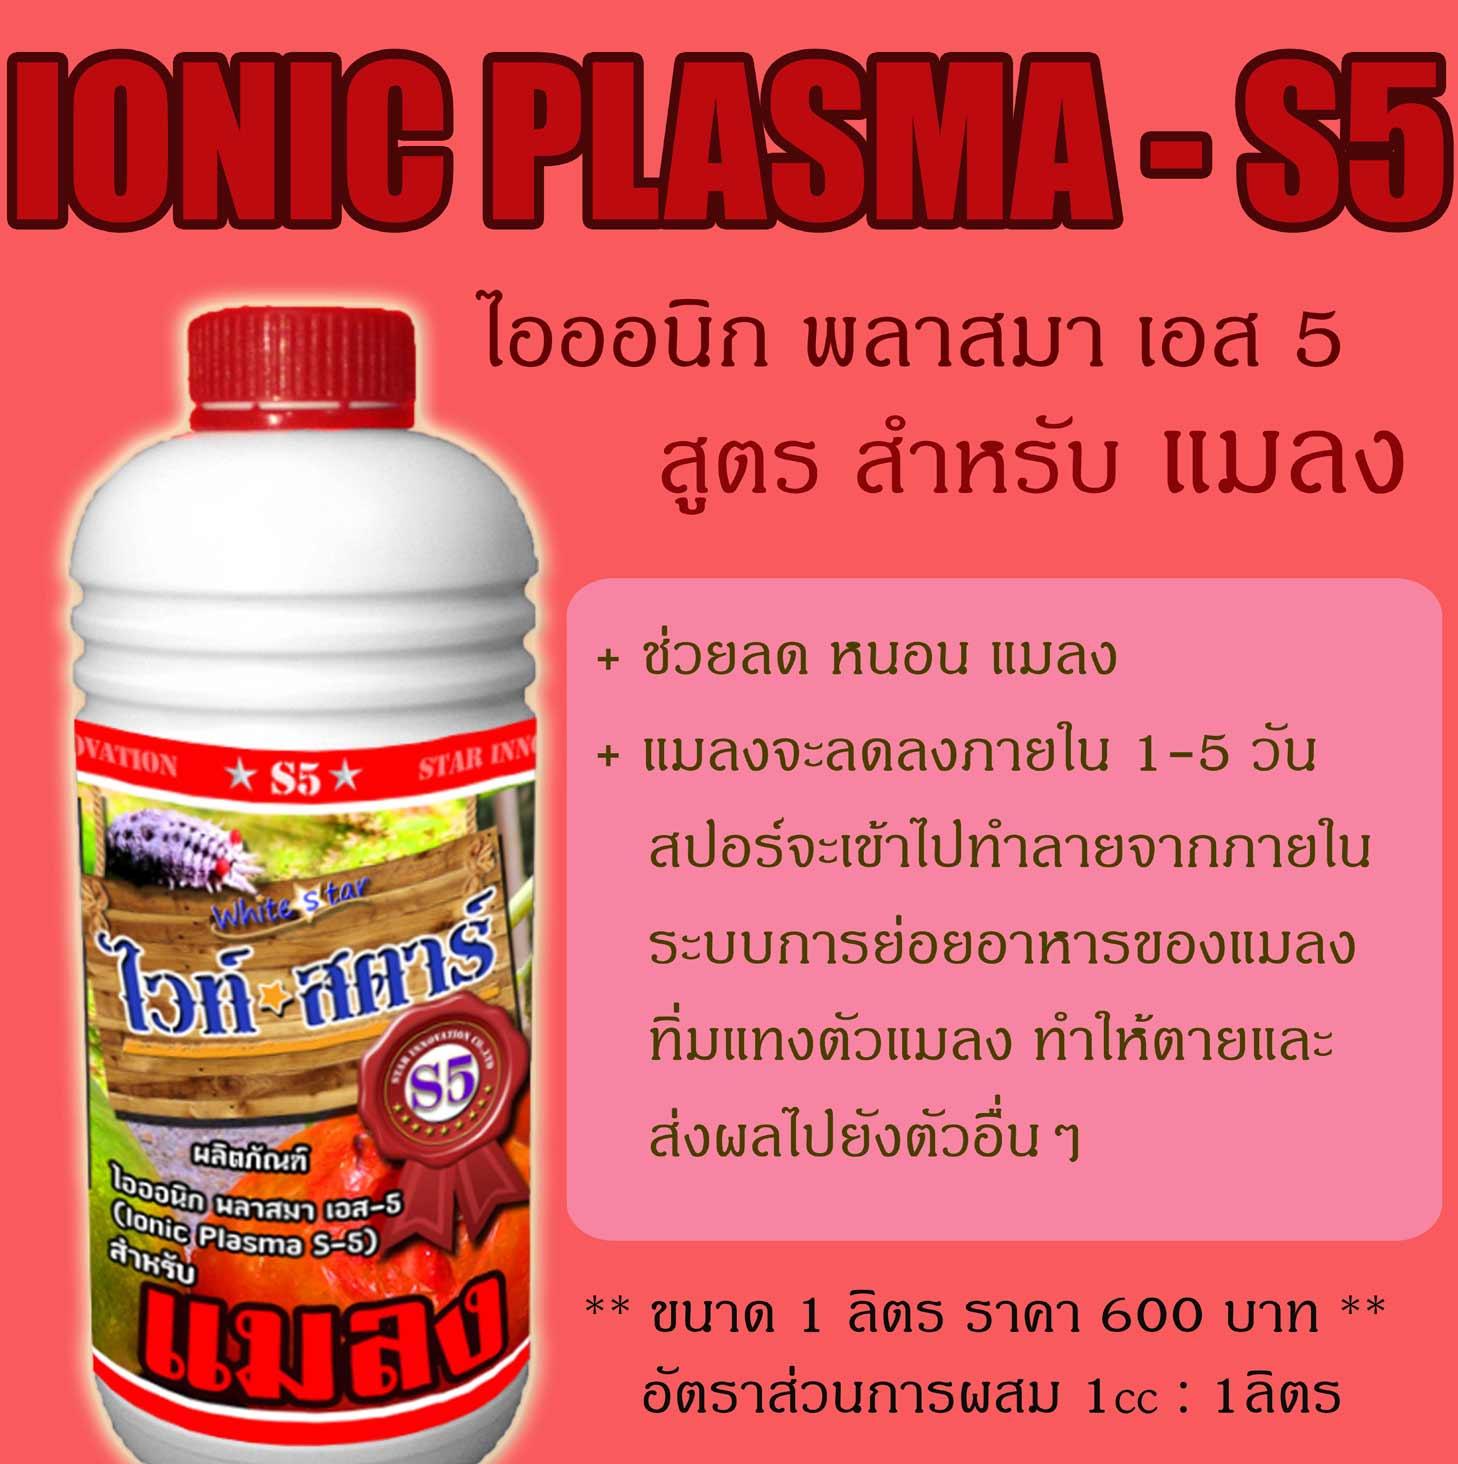 Ionic Plasma S5 ไอออนิก พลาสมา สำหรับ แมลง 1000 ml